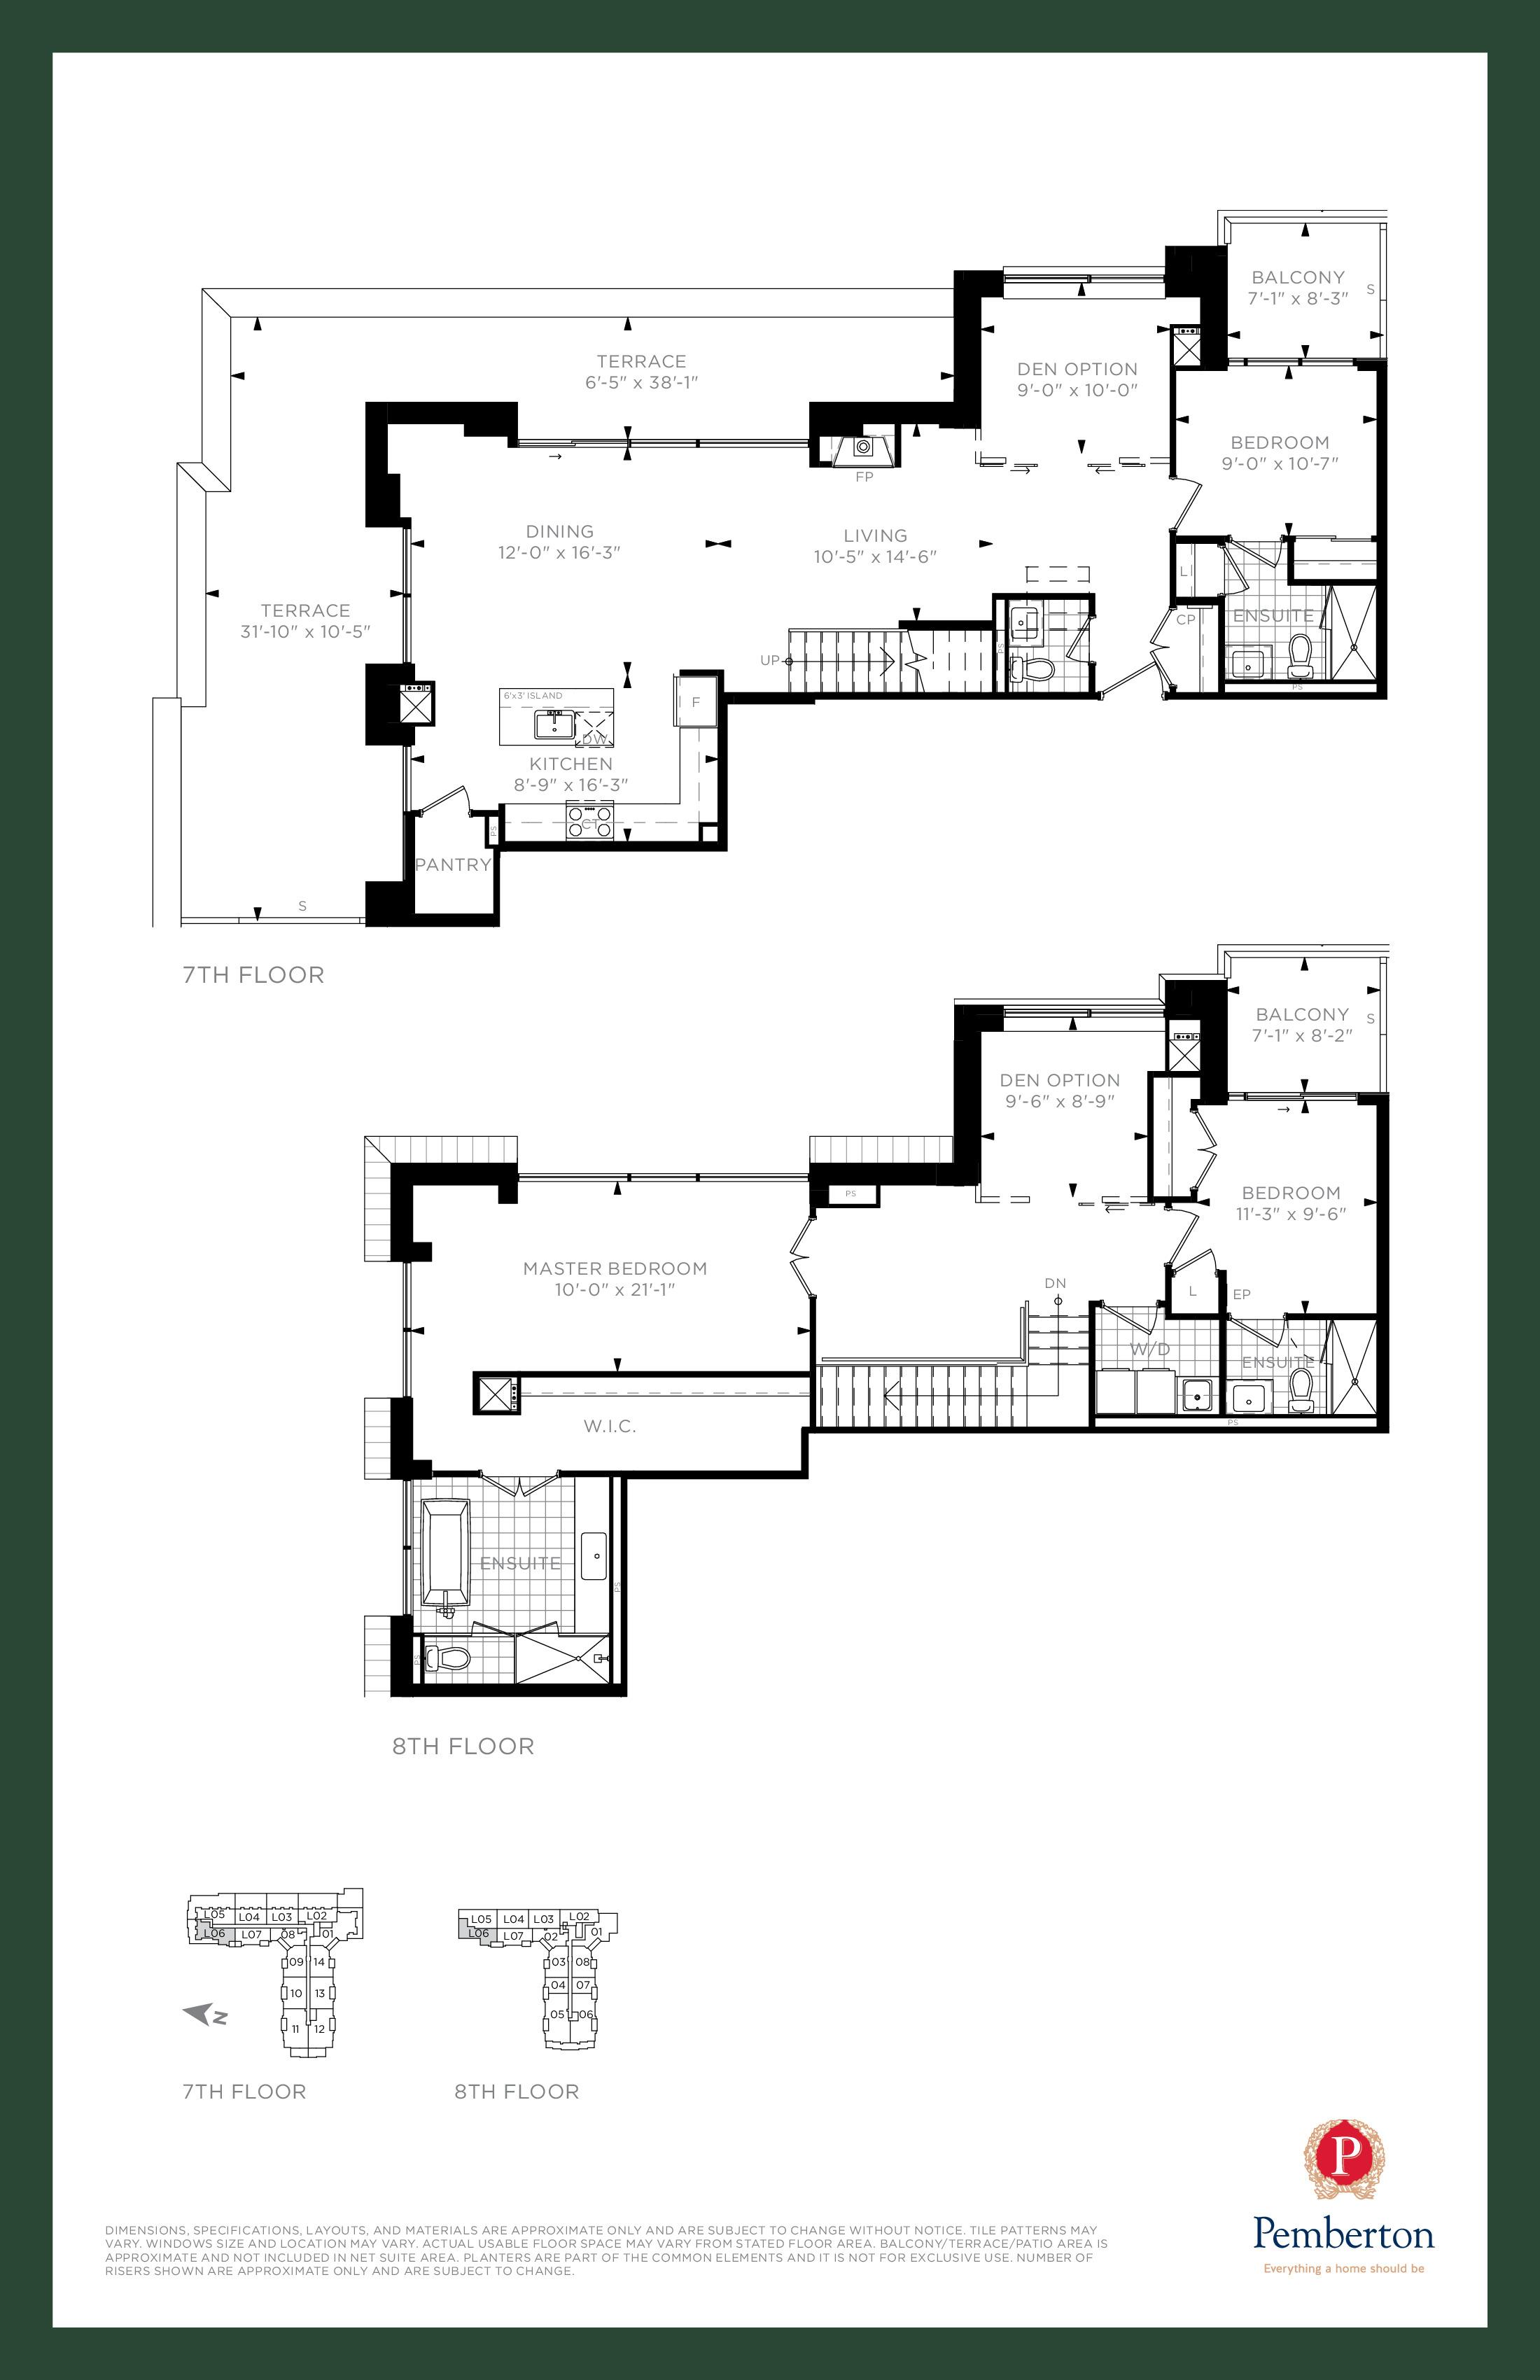 Loft D - Building A Floor Plan at 9th & Main Condos + Towns - 2200 sq.ft